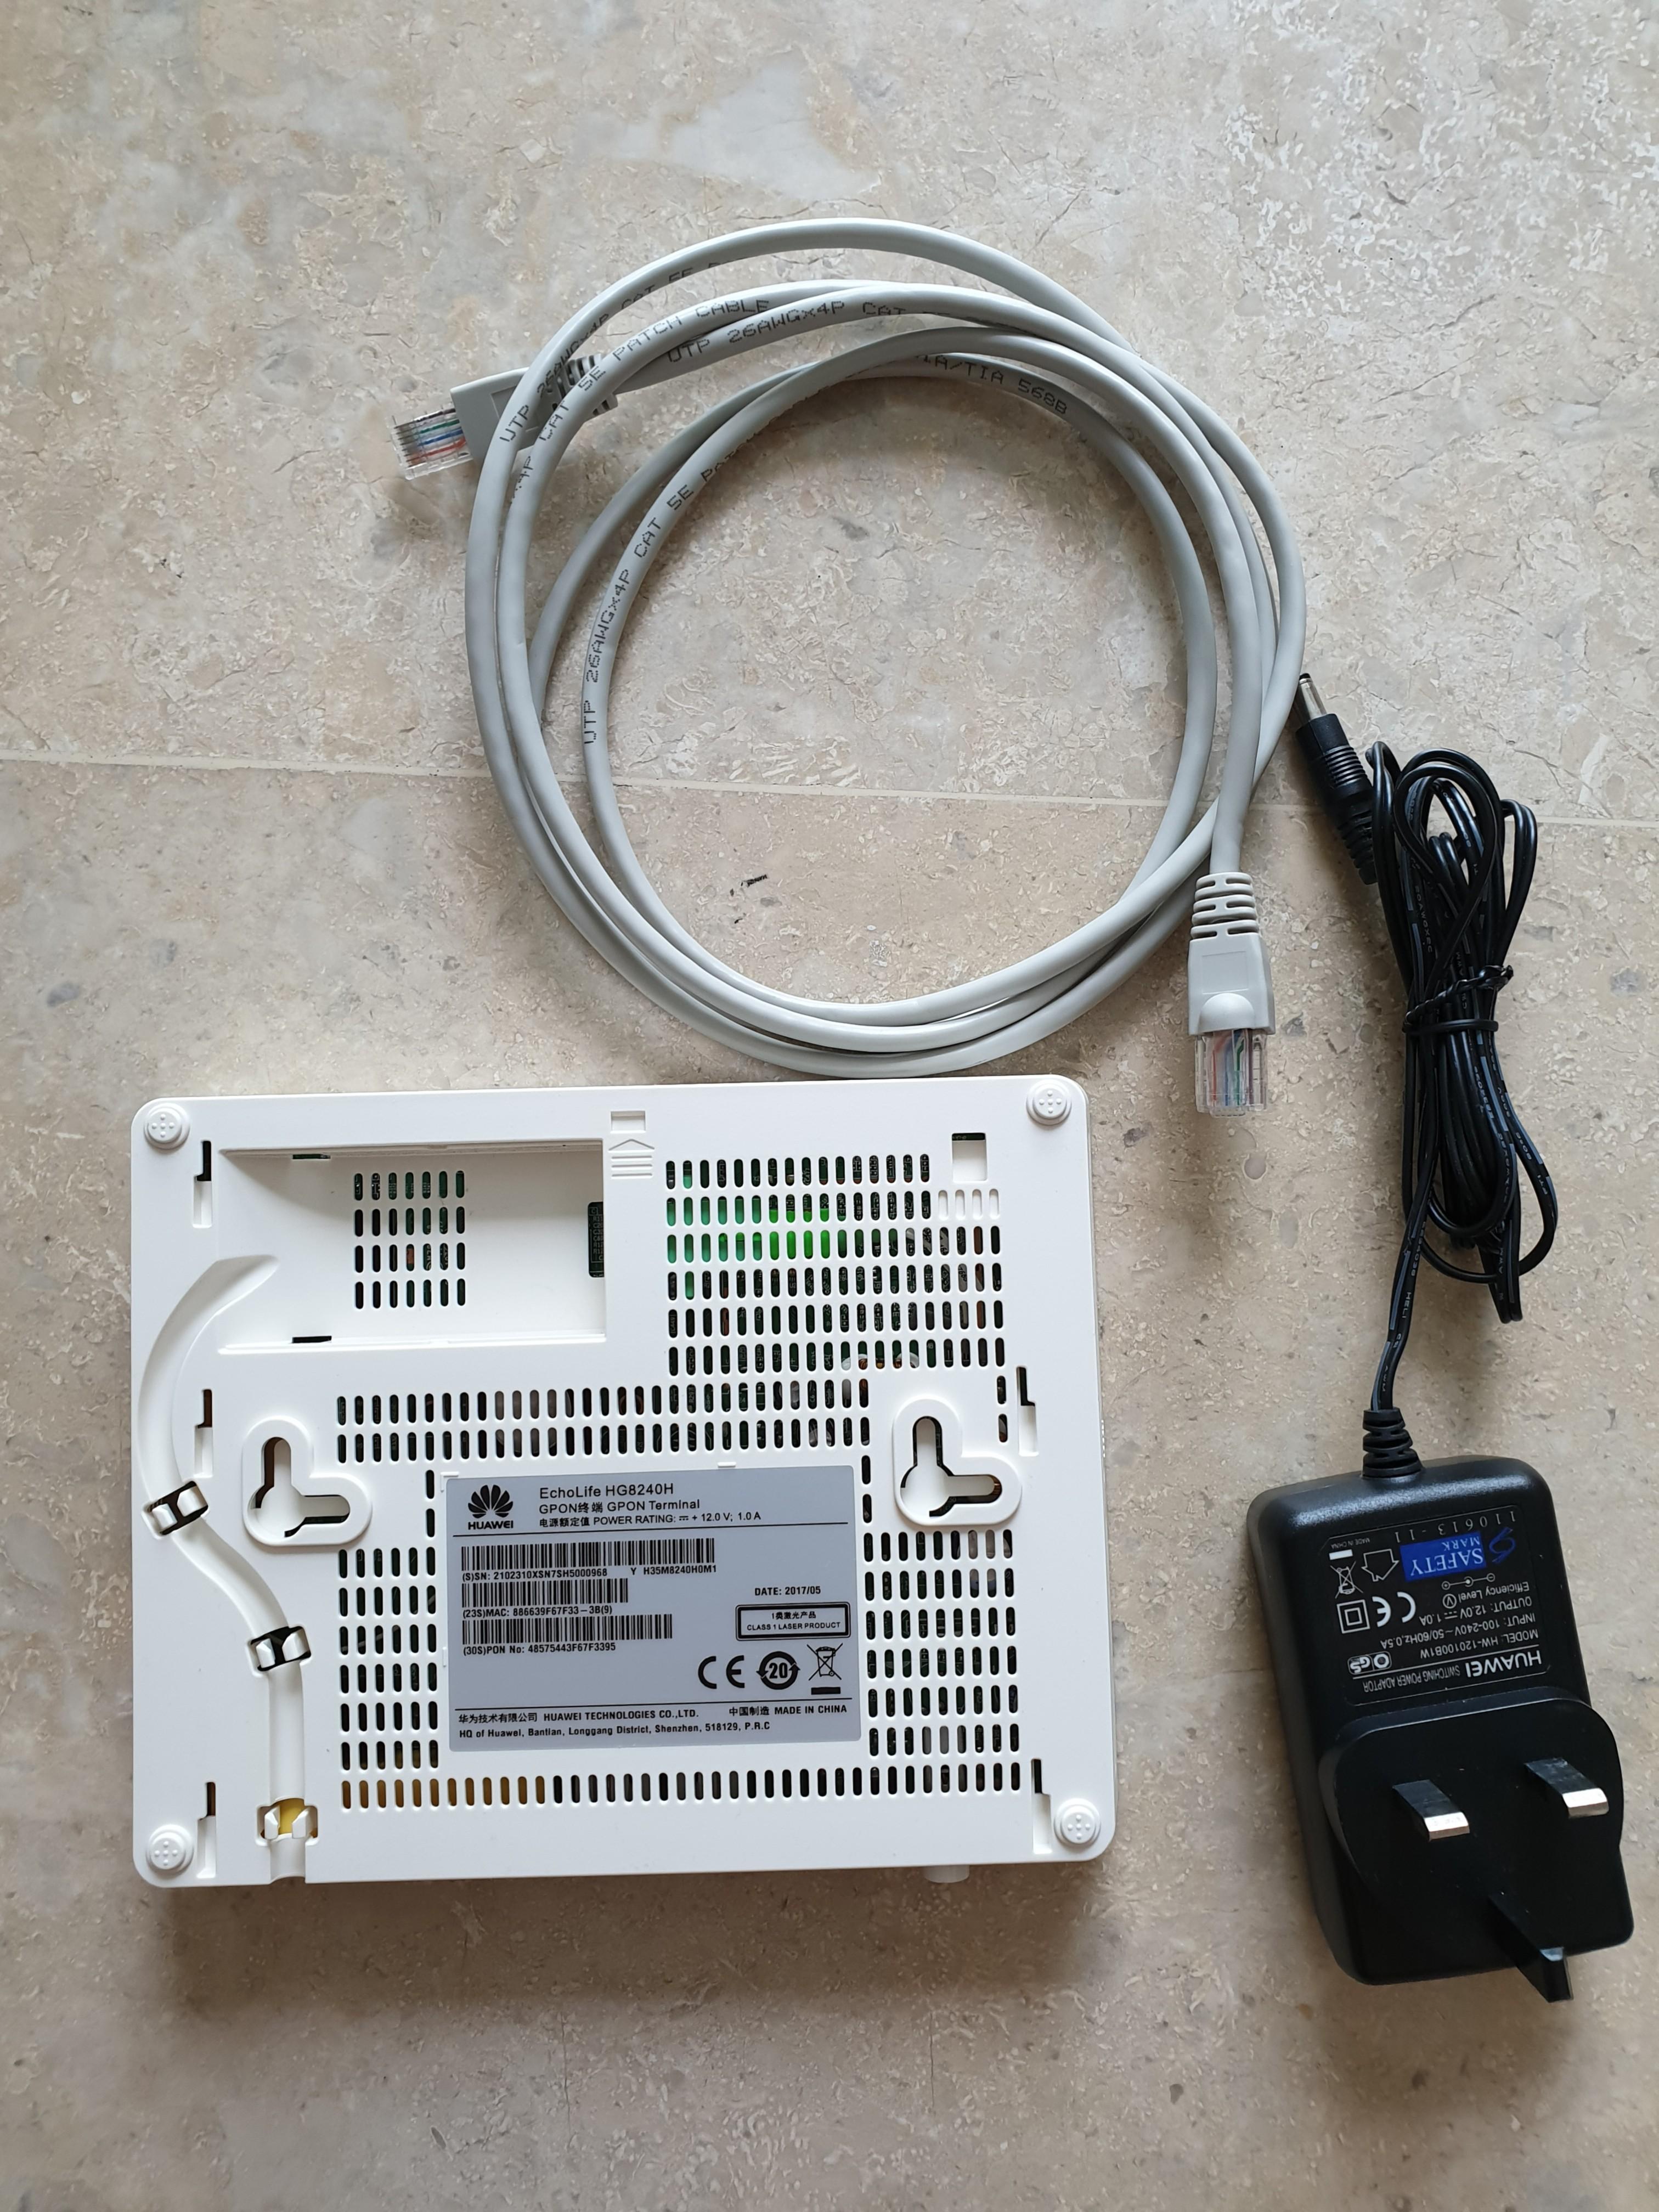 Huawei EchoLife HG8240H Fiber Modem